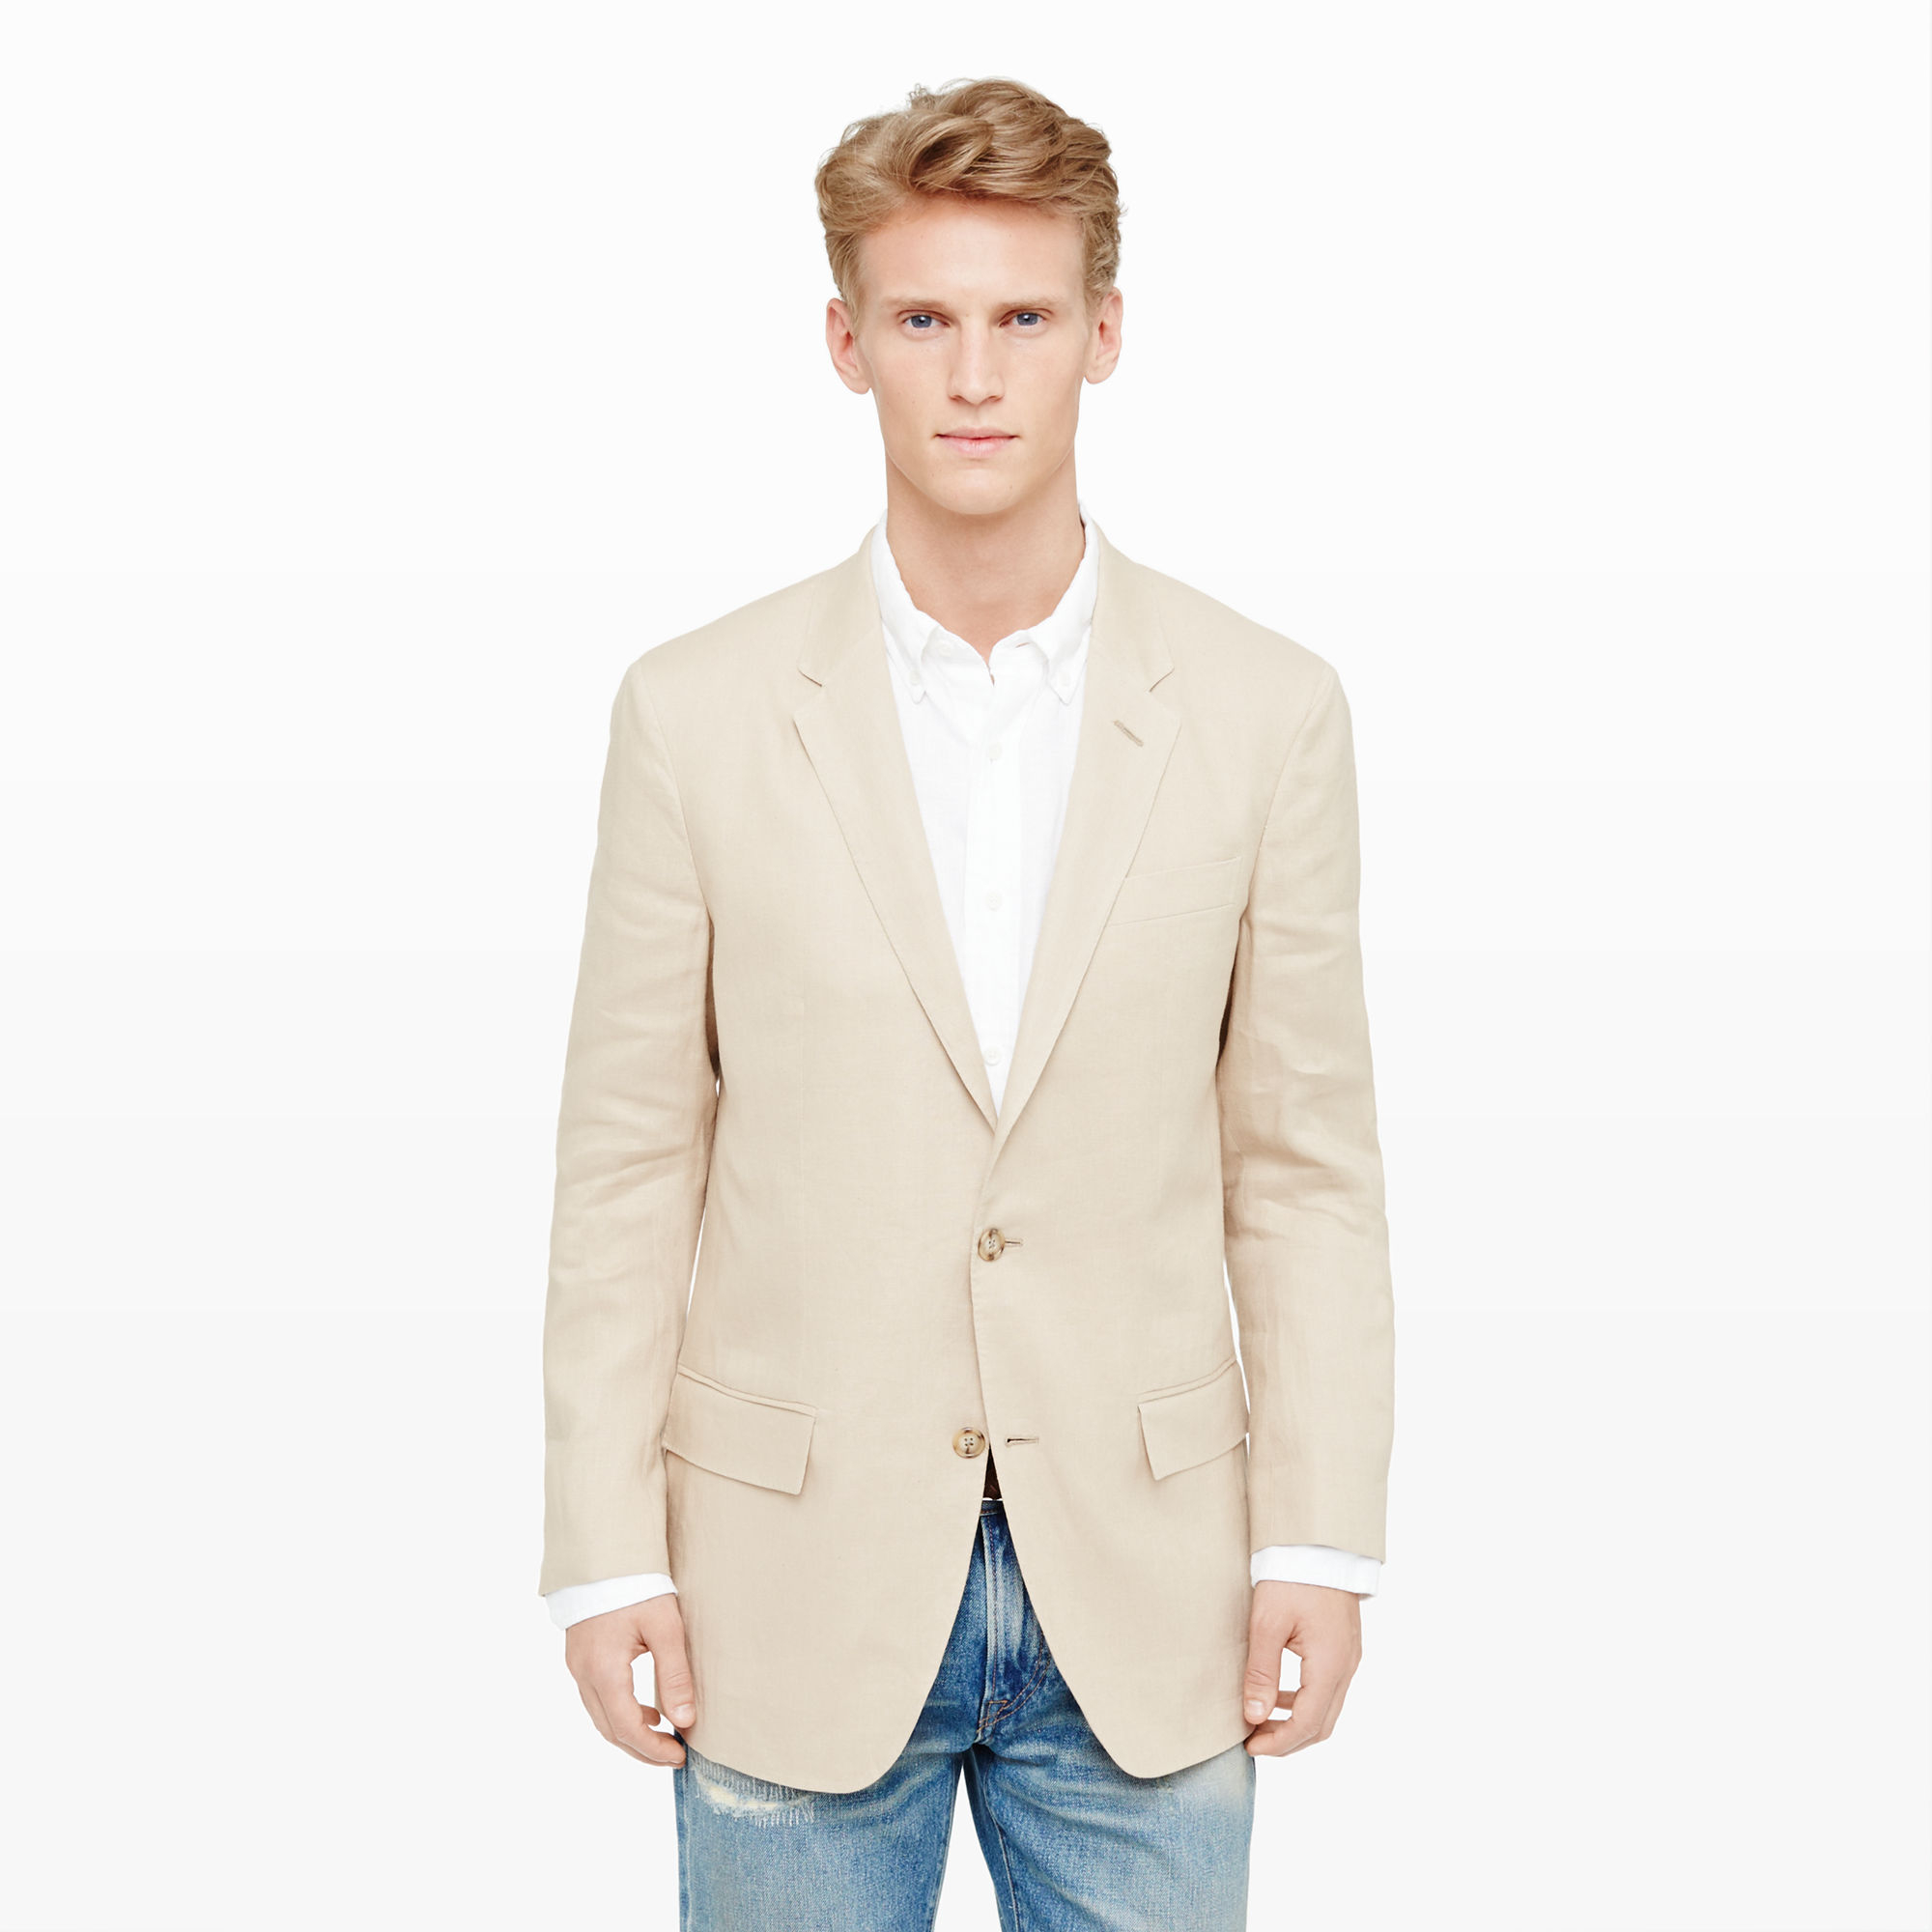 c0644bdf264b Club Monaco New Grant Italian Linen Blazer in Natural for Men - Lyst